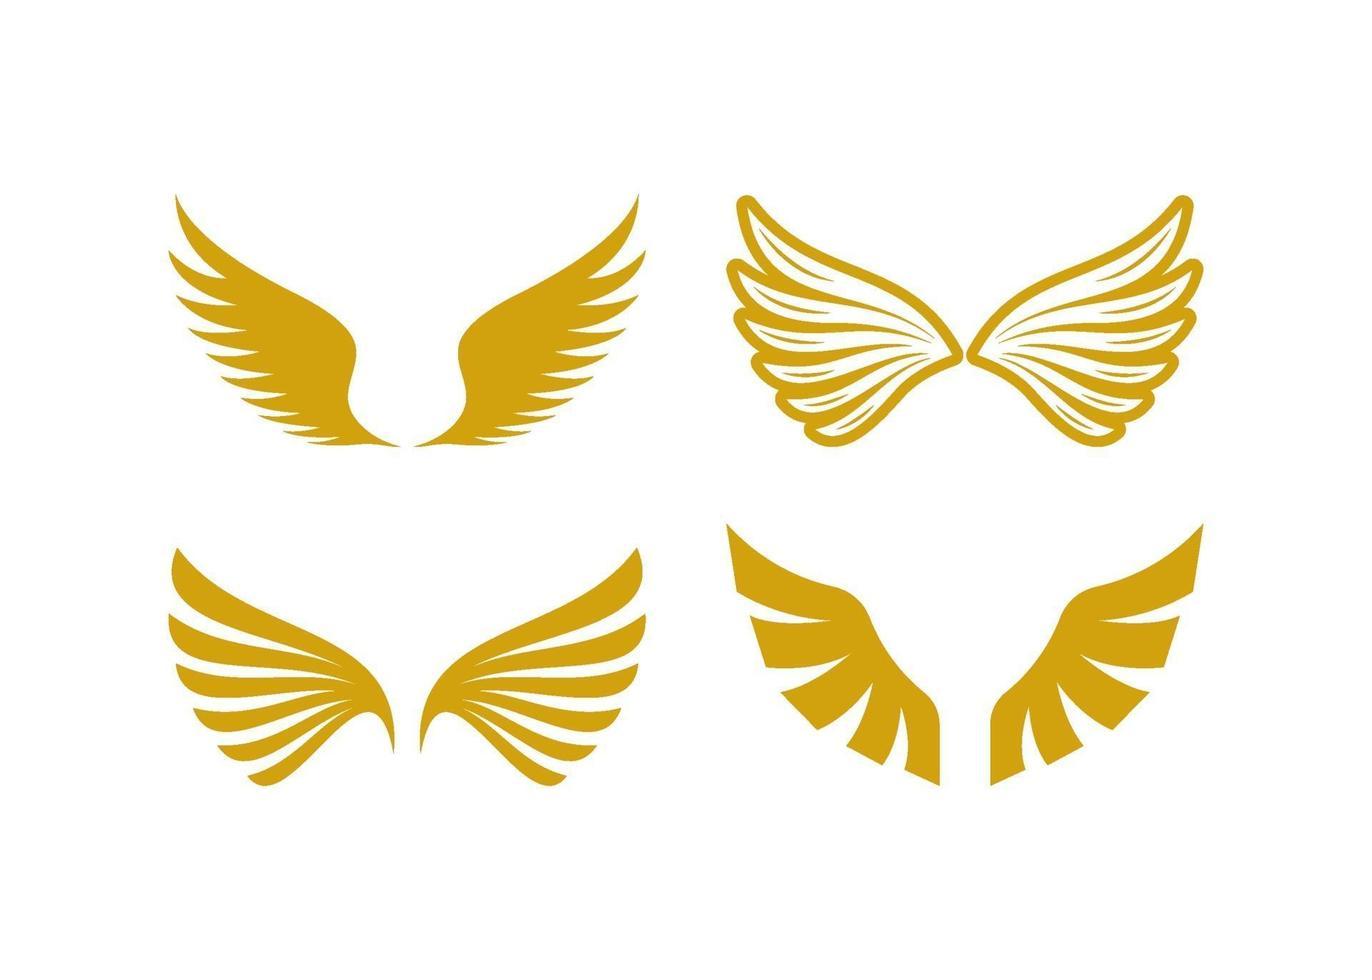 vleugels pictogram illustratie vector set